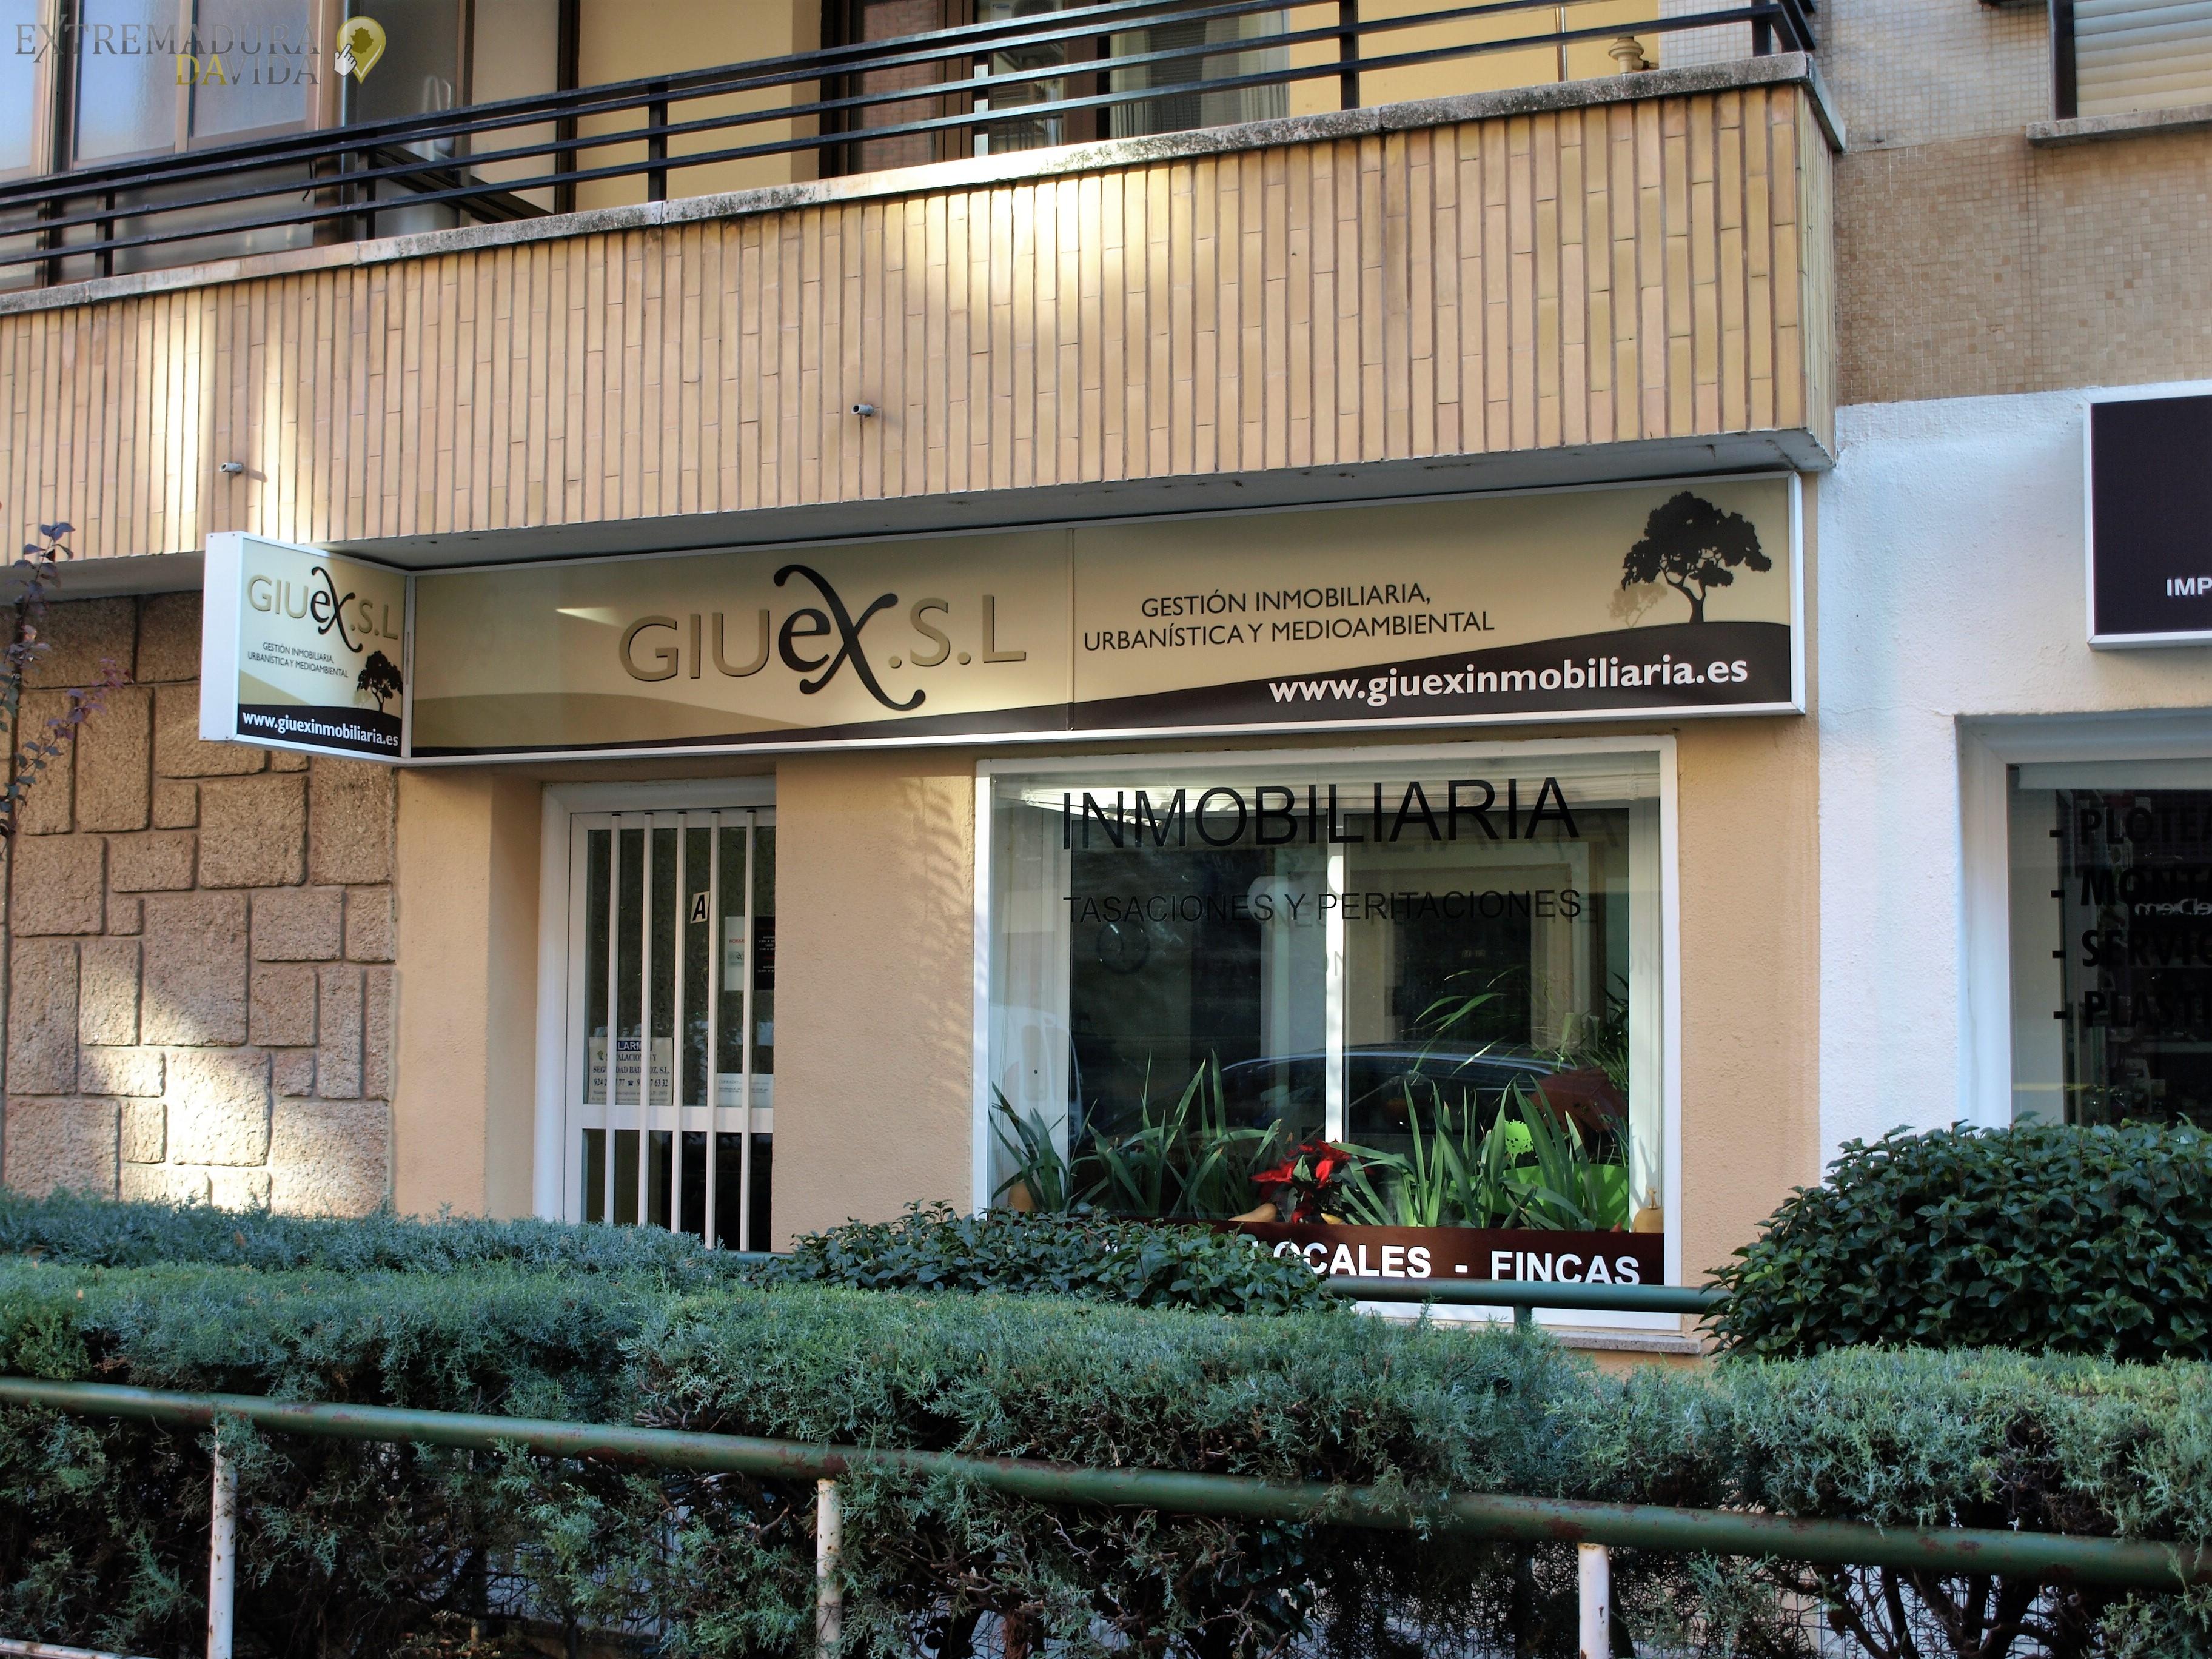 INMOBILIARIA CACERES GESTIONES GIUEX - AGENTE INMOBILIARIO